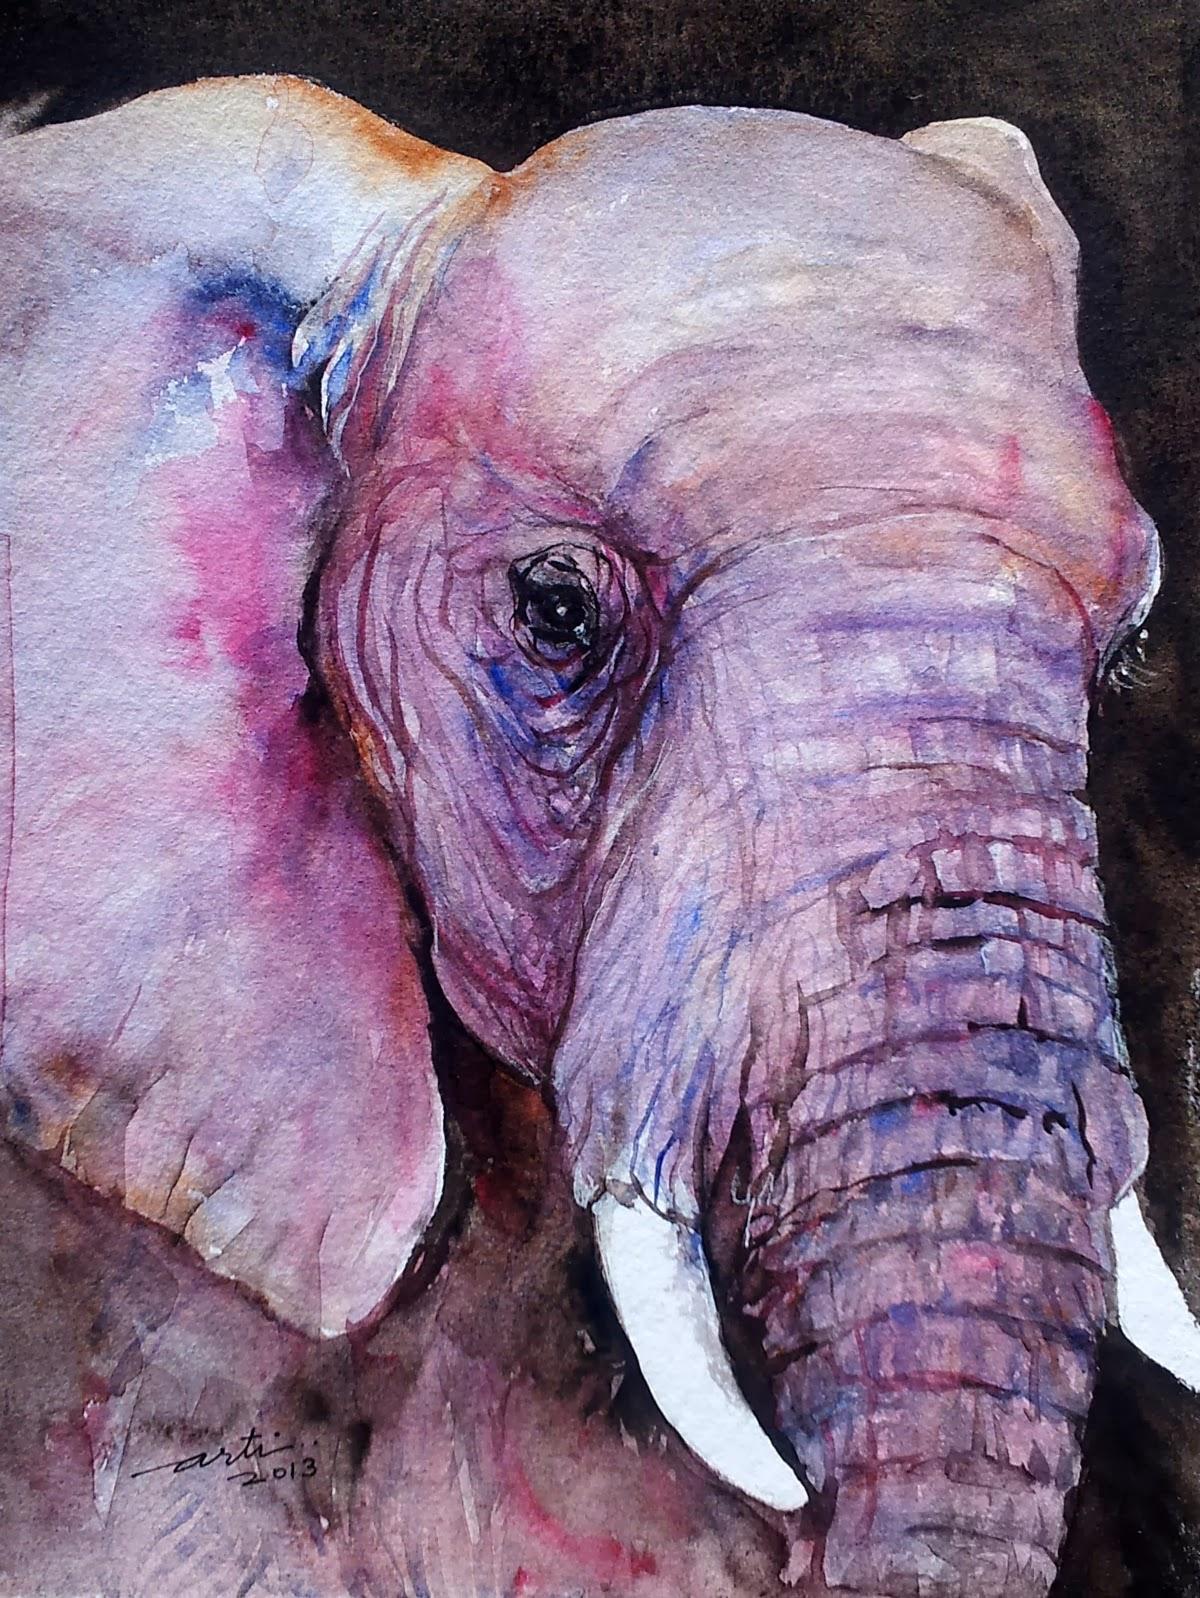 Arti S Art Life As I See It Elephant Paintings